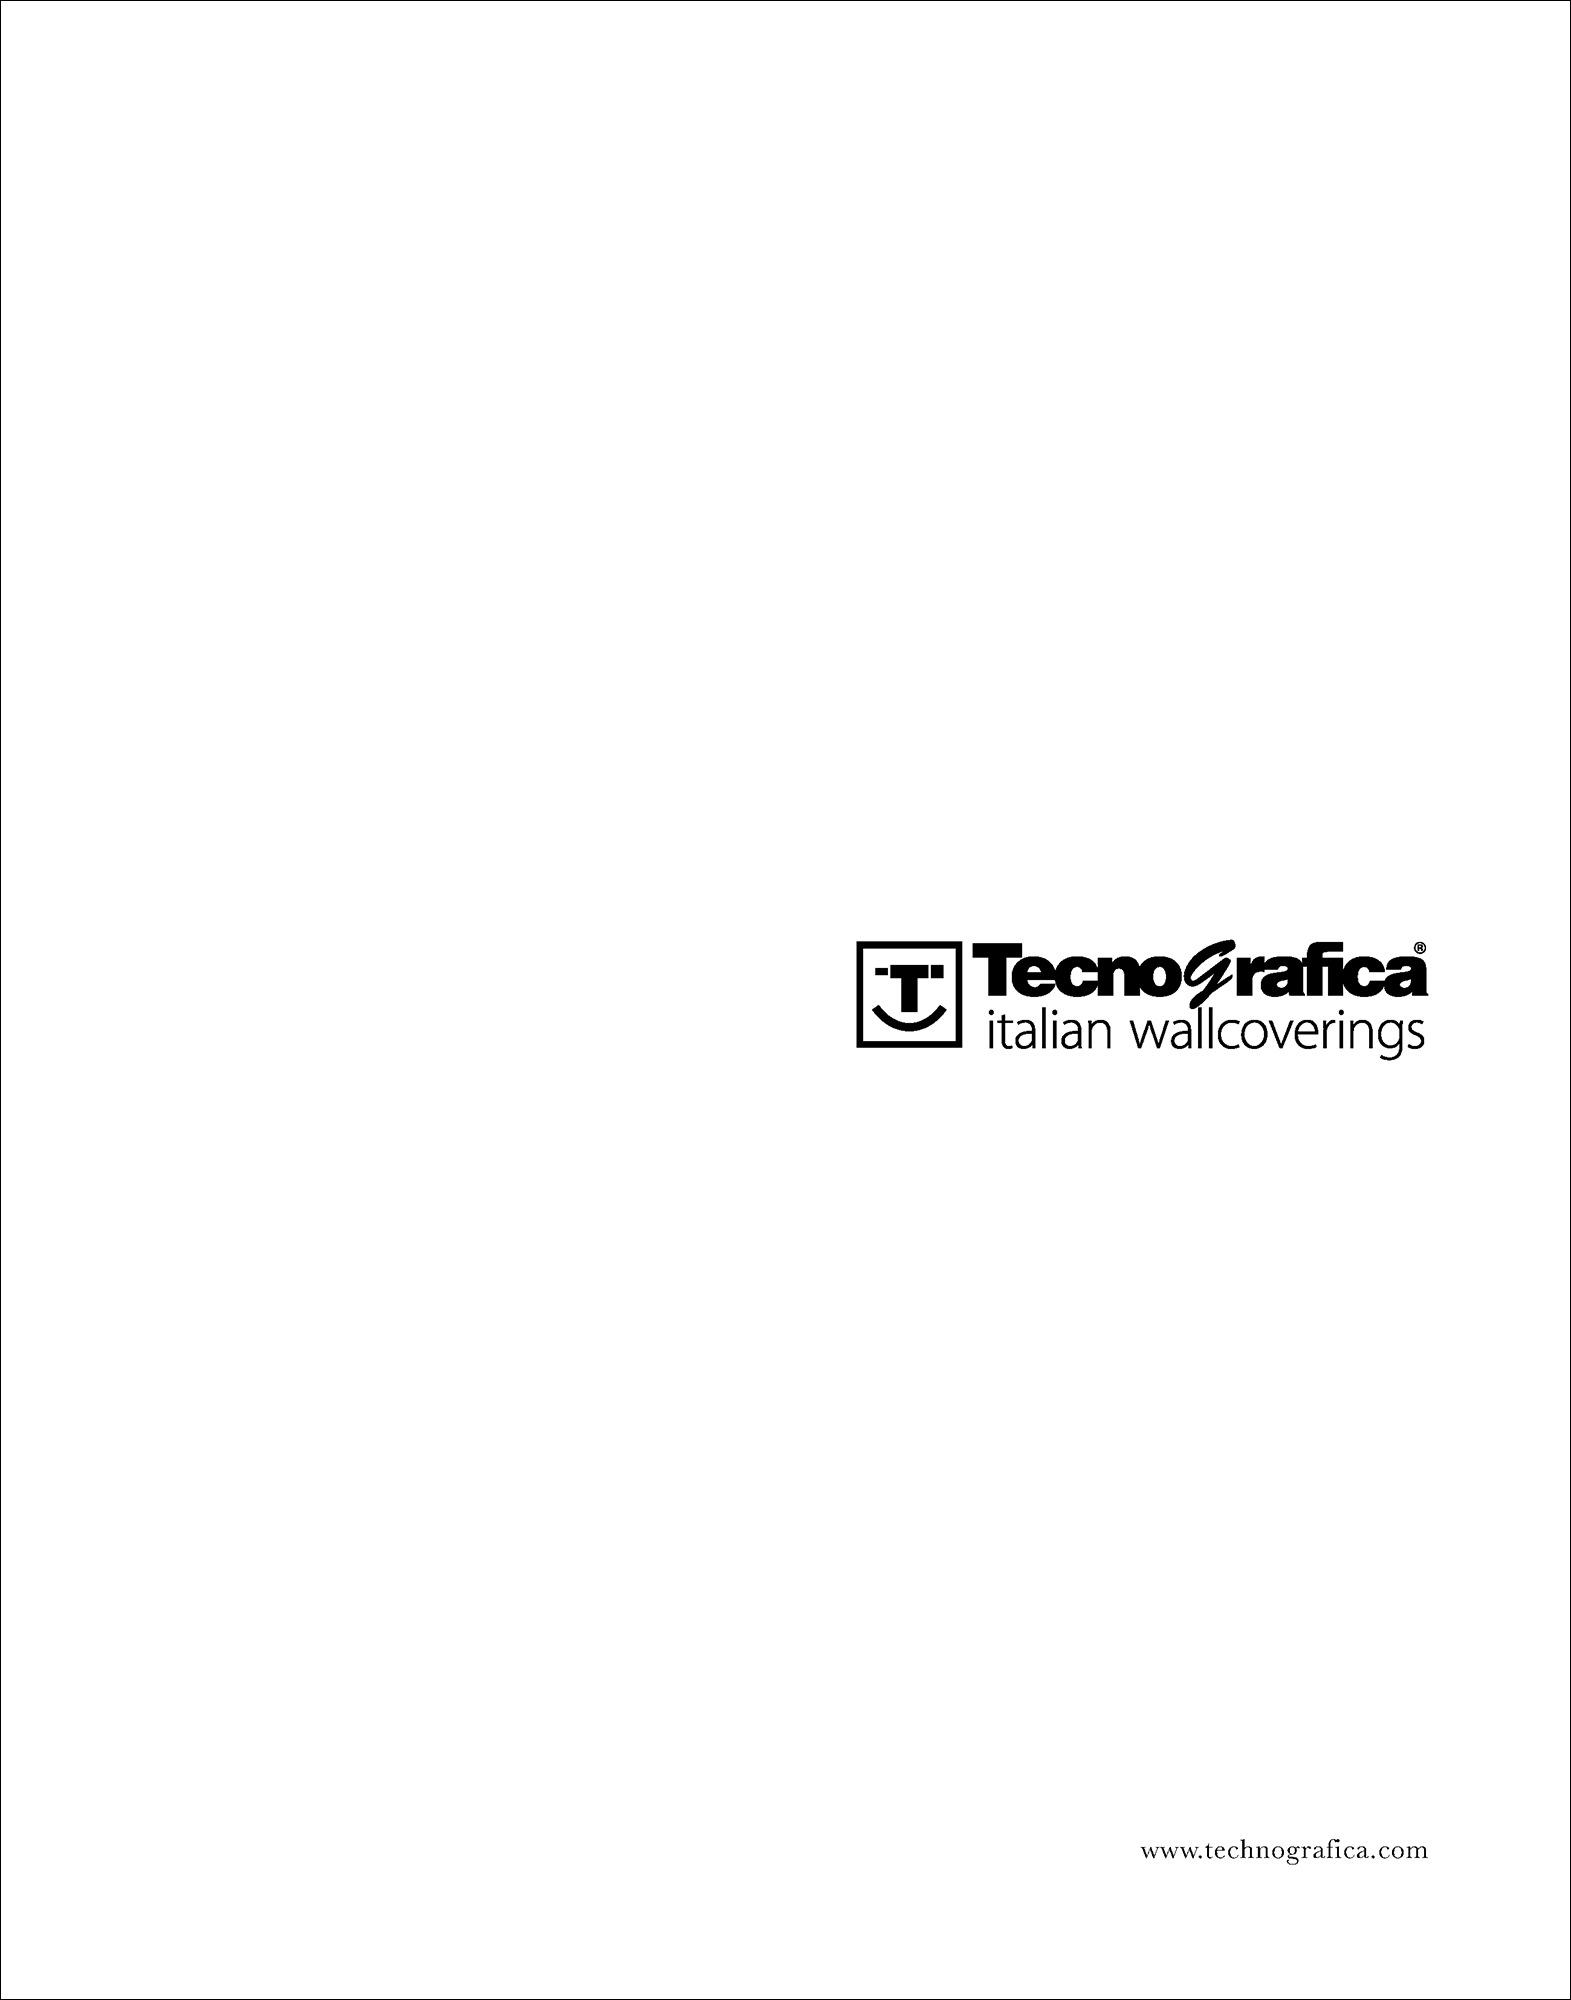 print adv hipix catalogo tecnografica immagine 1